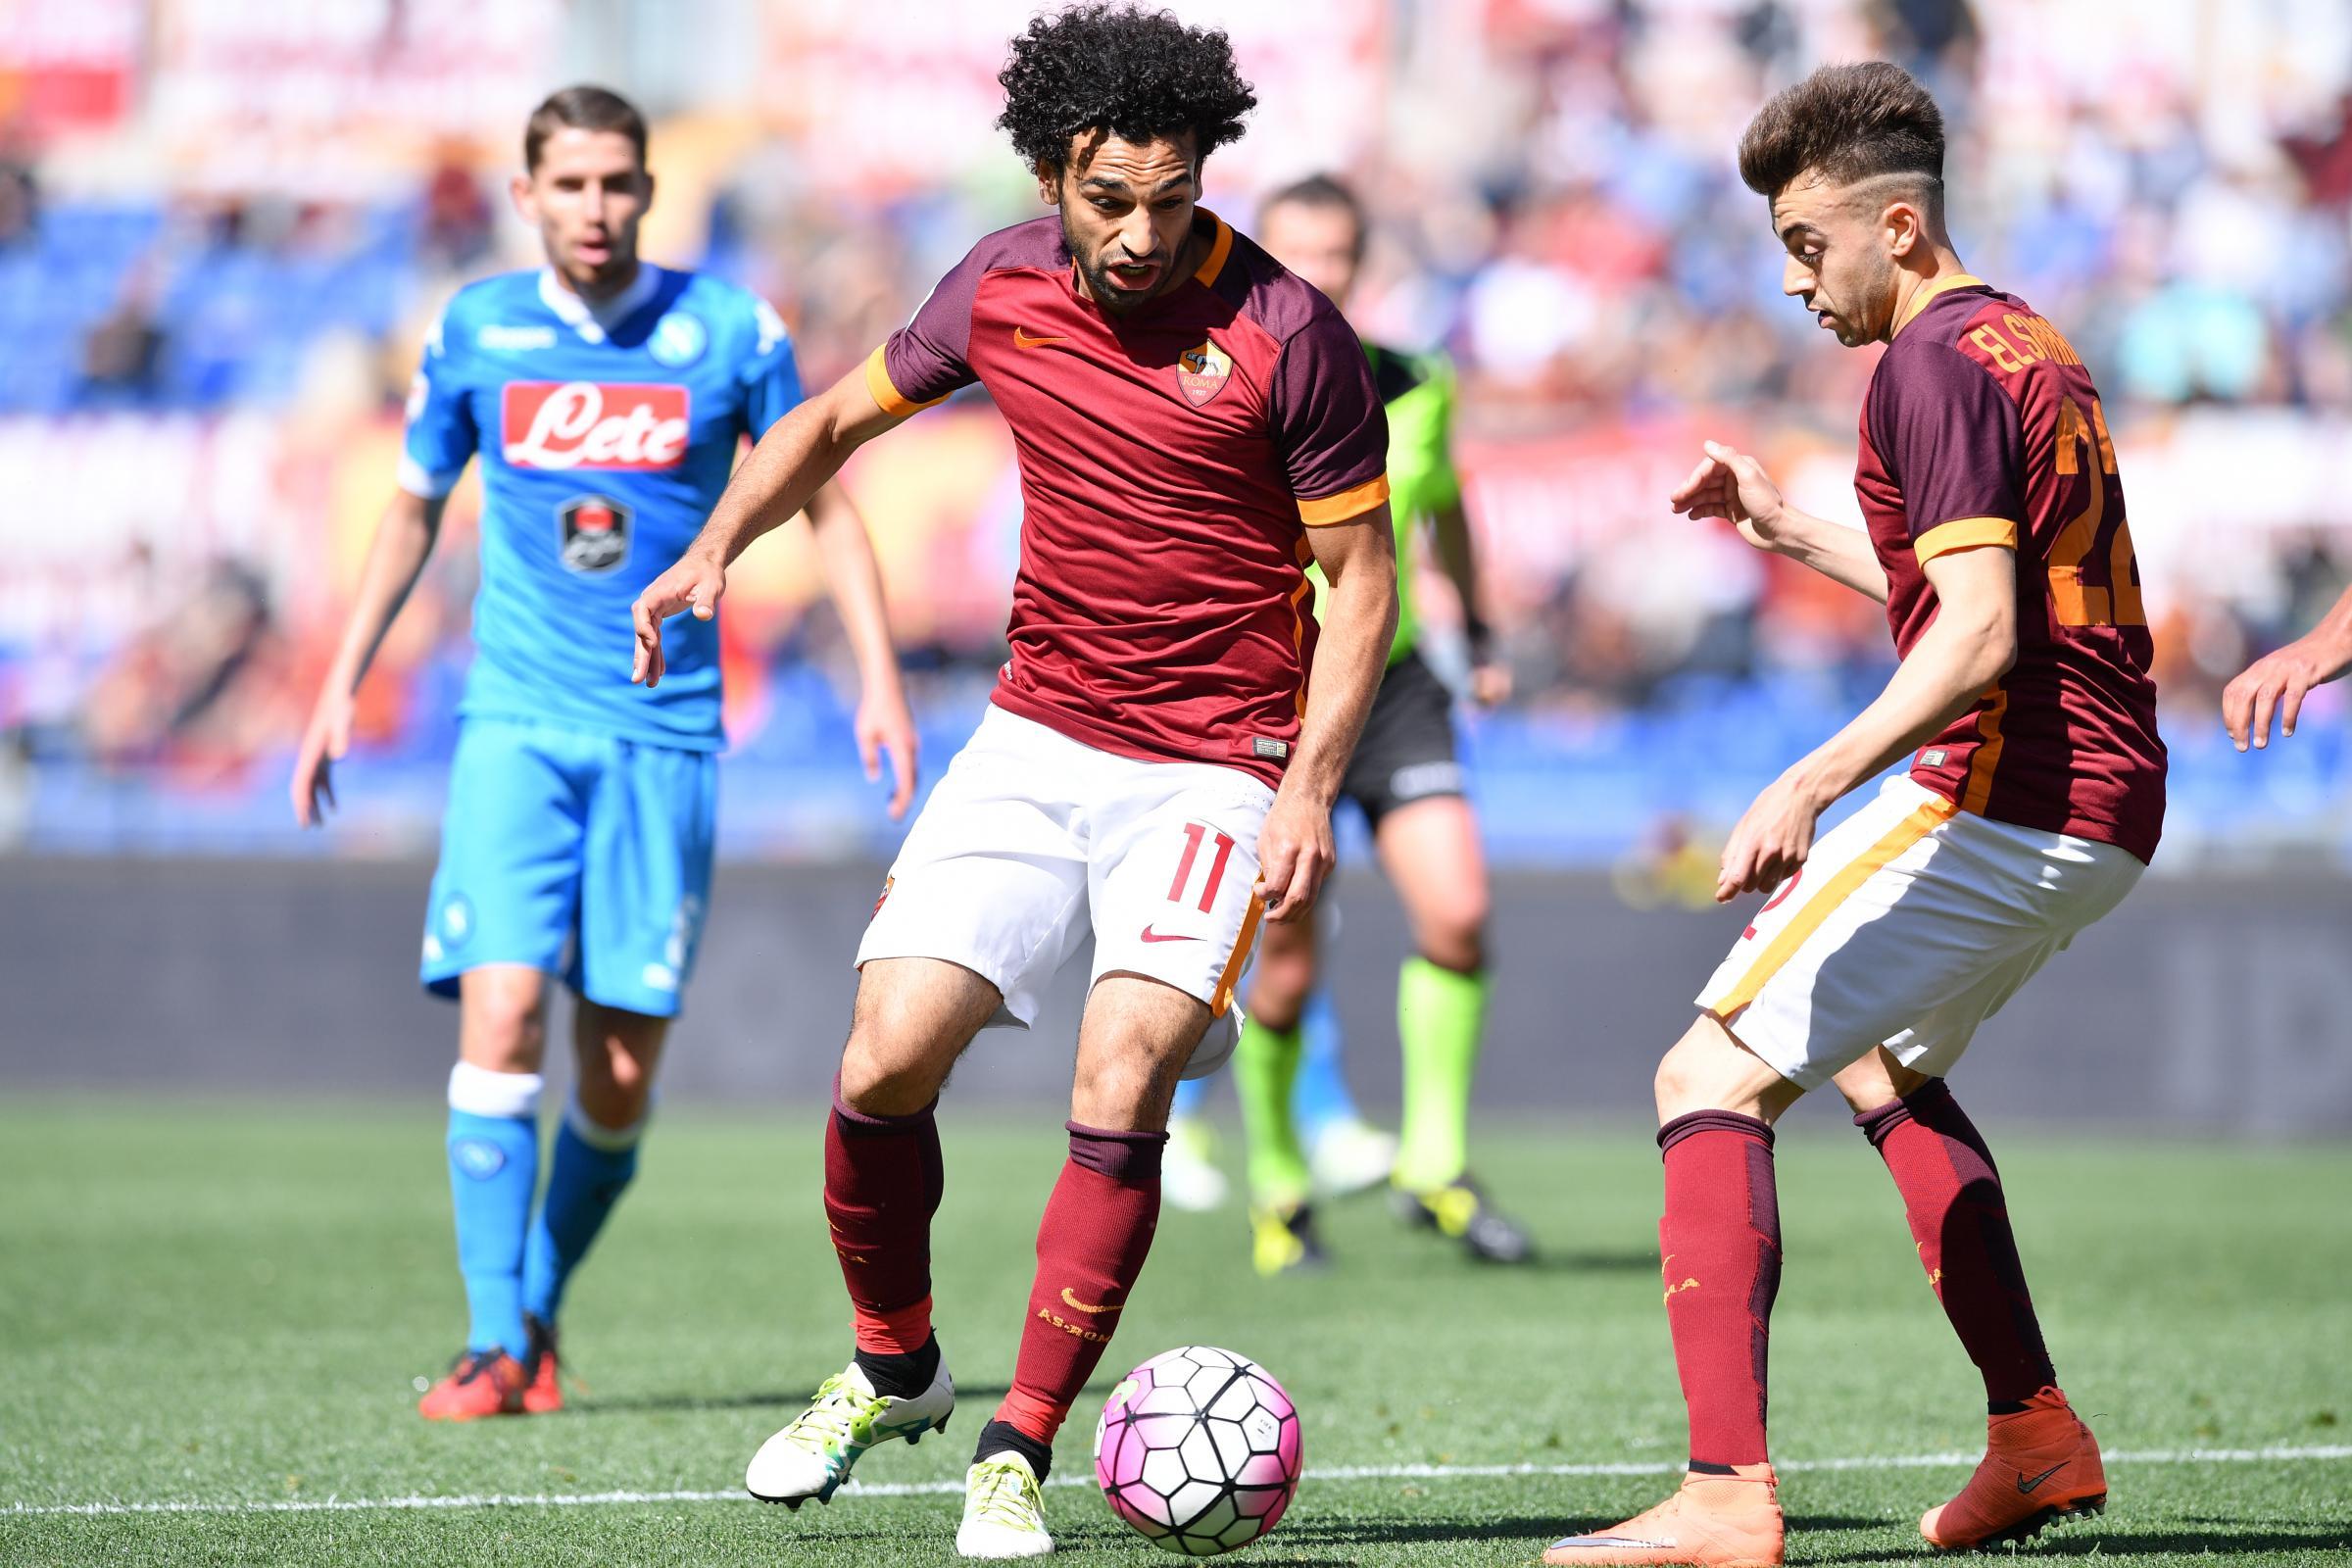 Lista calciatori Fantacalcio Gazzetta 2016 2017: i Trequartisti